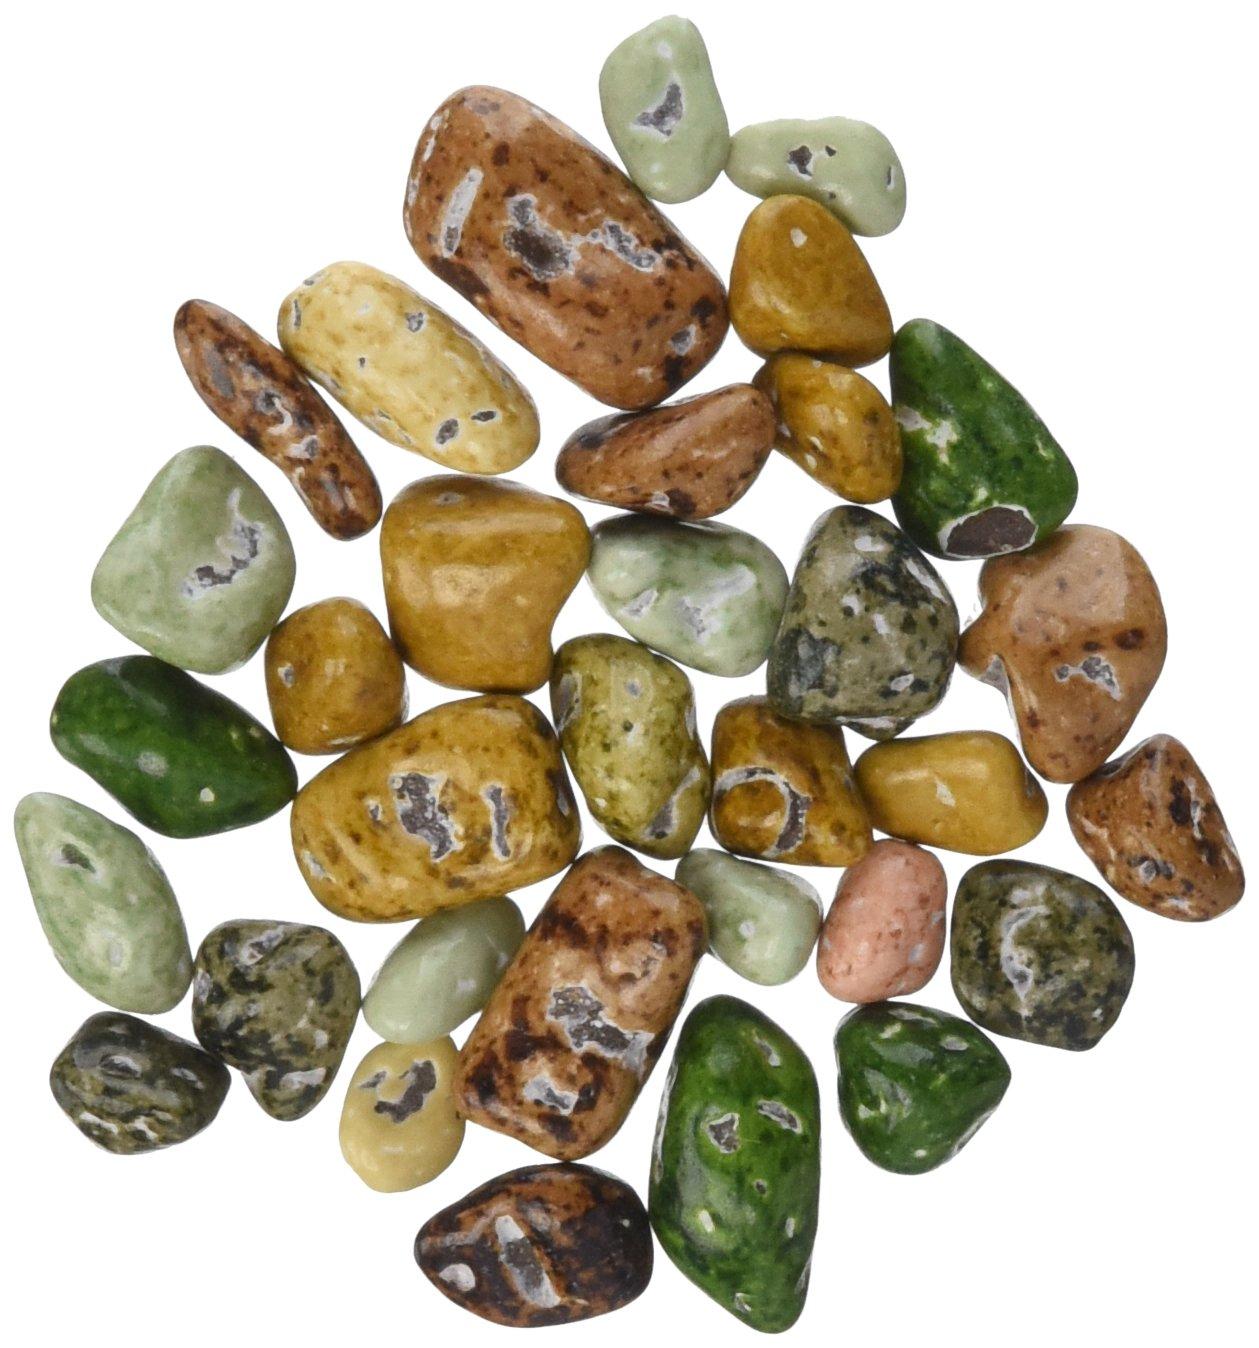 Amazon.com : Chocolate River Rocks (1lb Bag) : Grocery & Gourmet Food